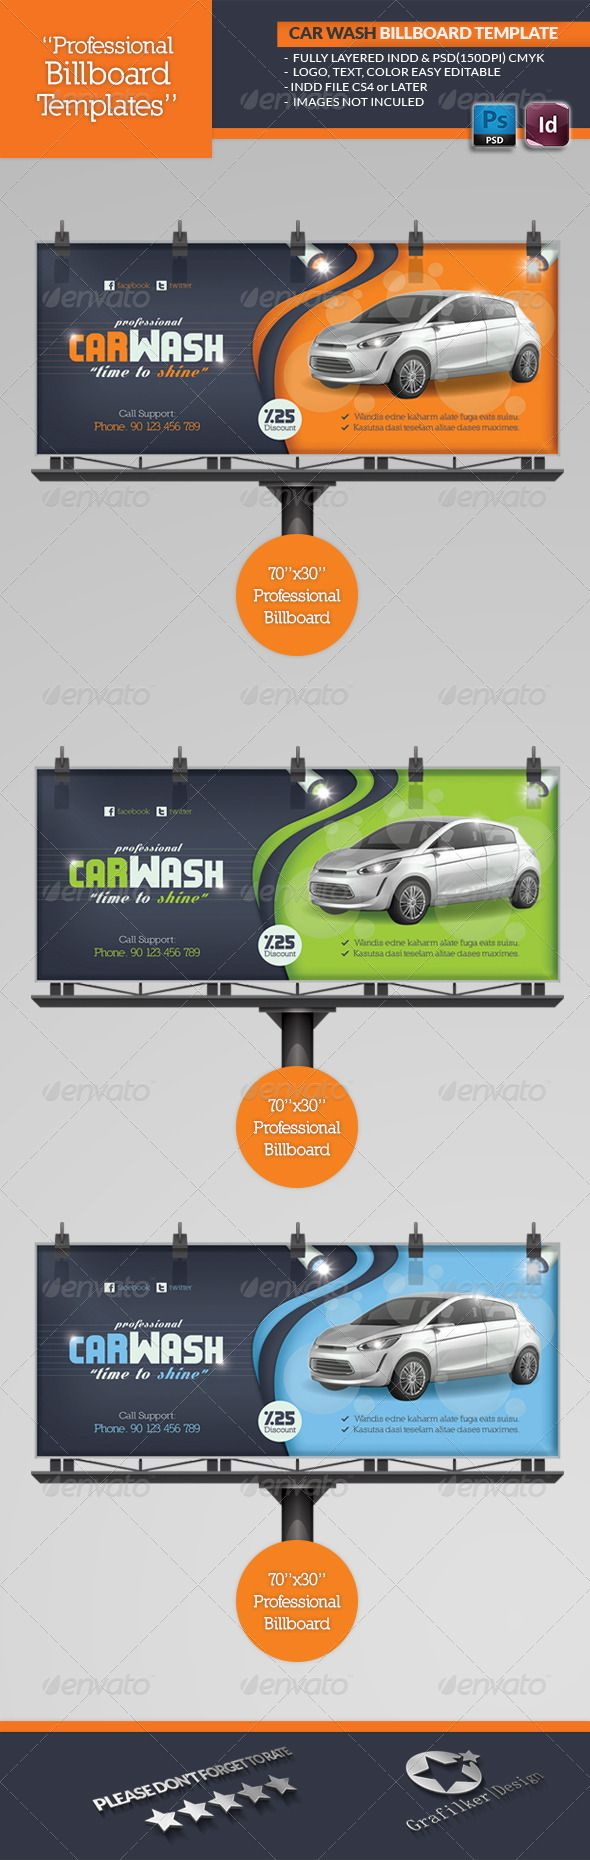 Car Wash Billboard Template #design Download: http://graphicriver.net/item/car-wash-billboard-template/4637393?ref=ksioks